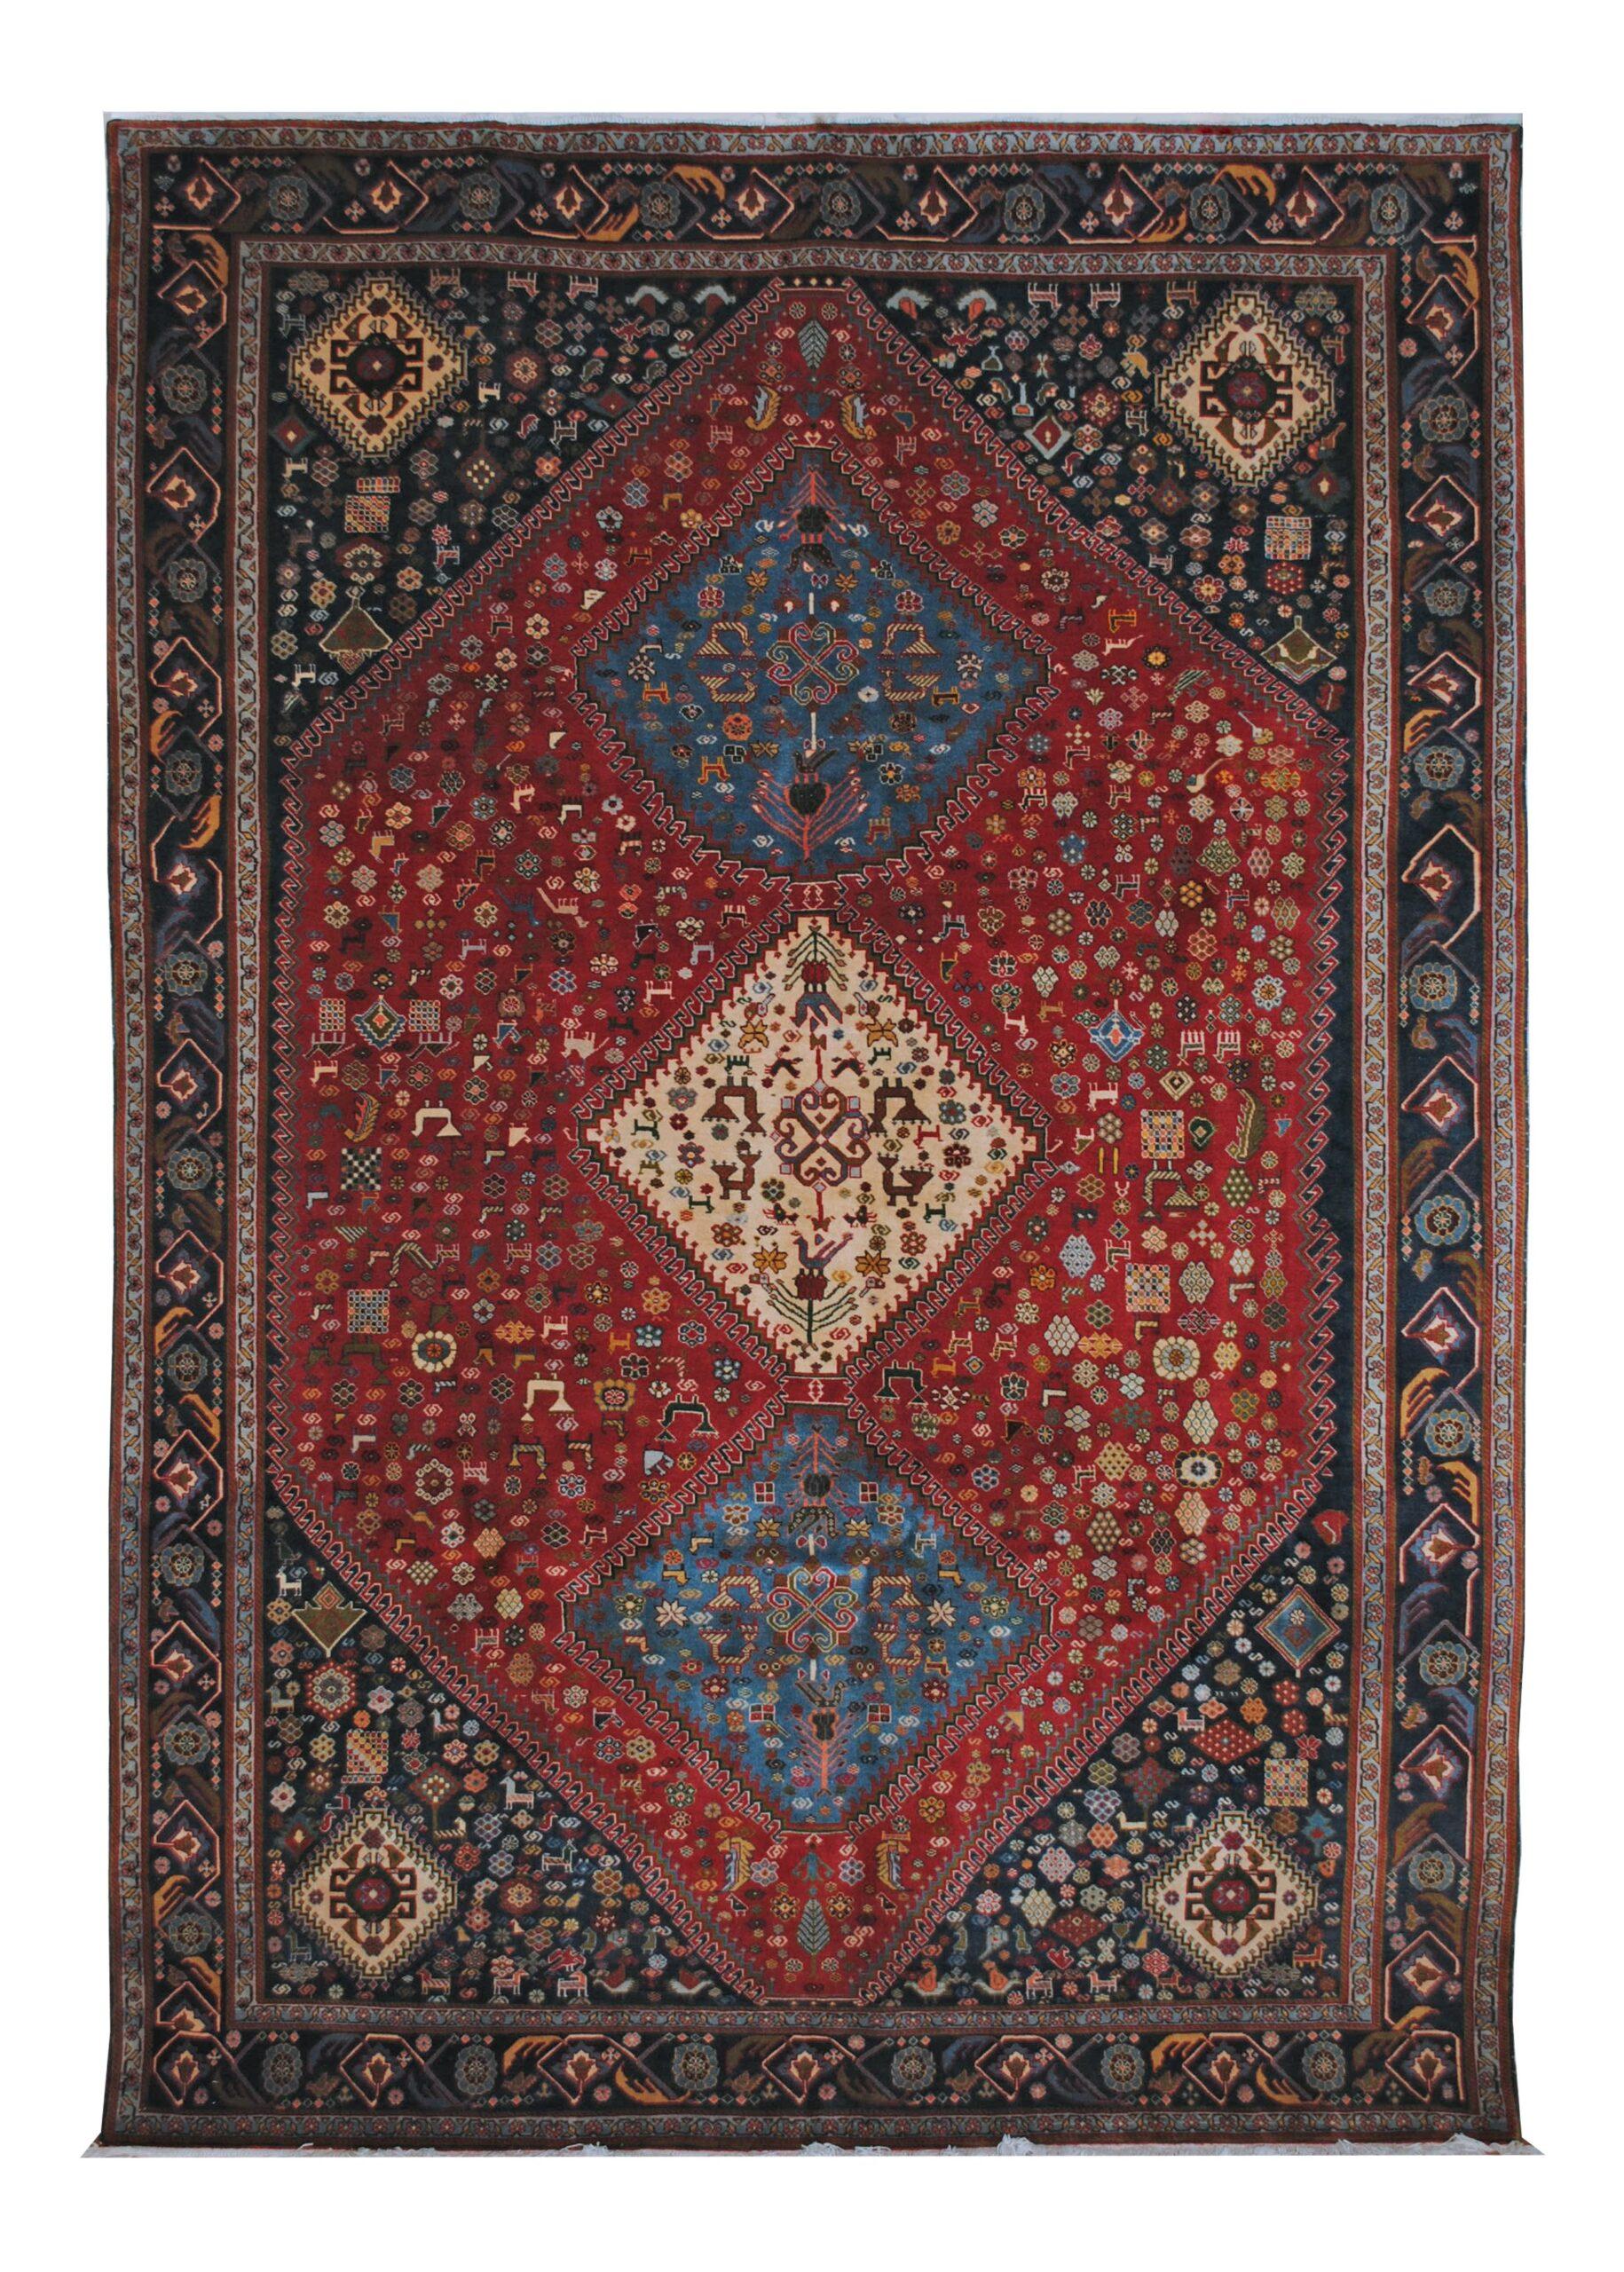 "Vintage Persian Ghashghaei 6' 5"" x 9' 6"" Handmade Wool Area Rug - Shabahang Royal Carpet"